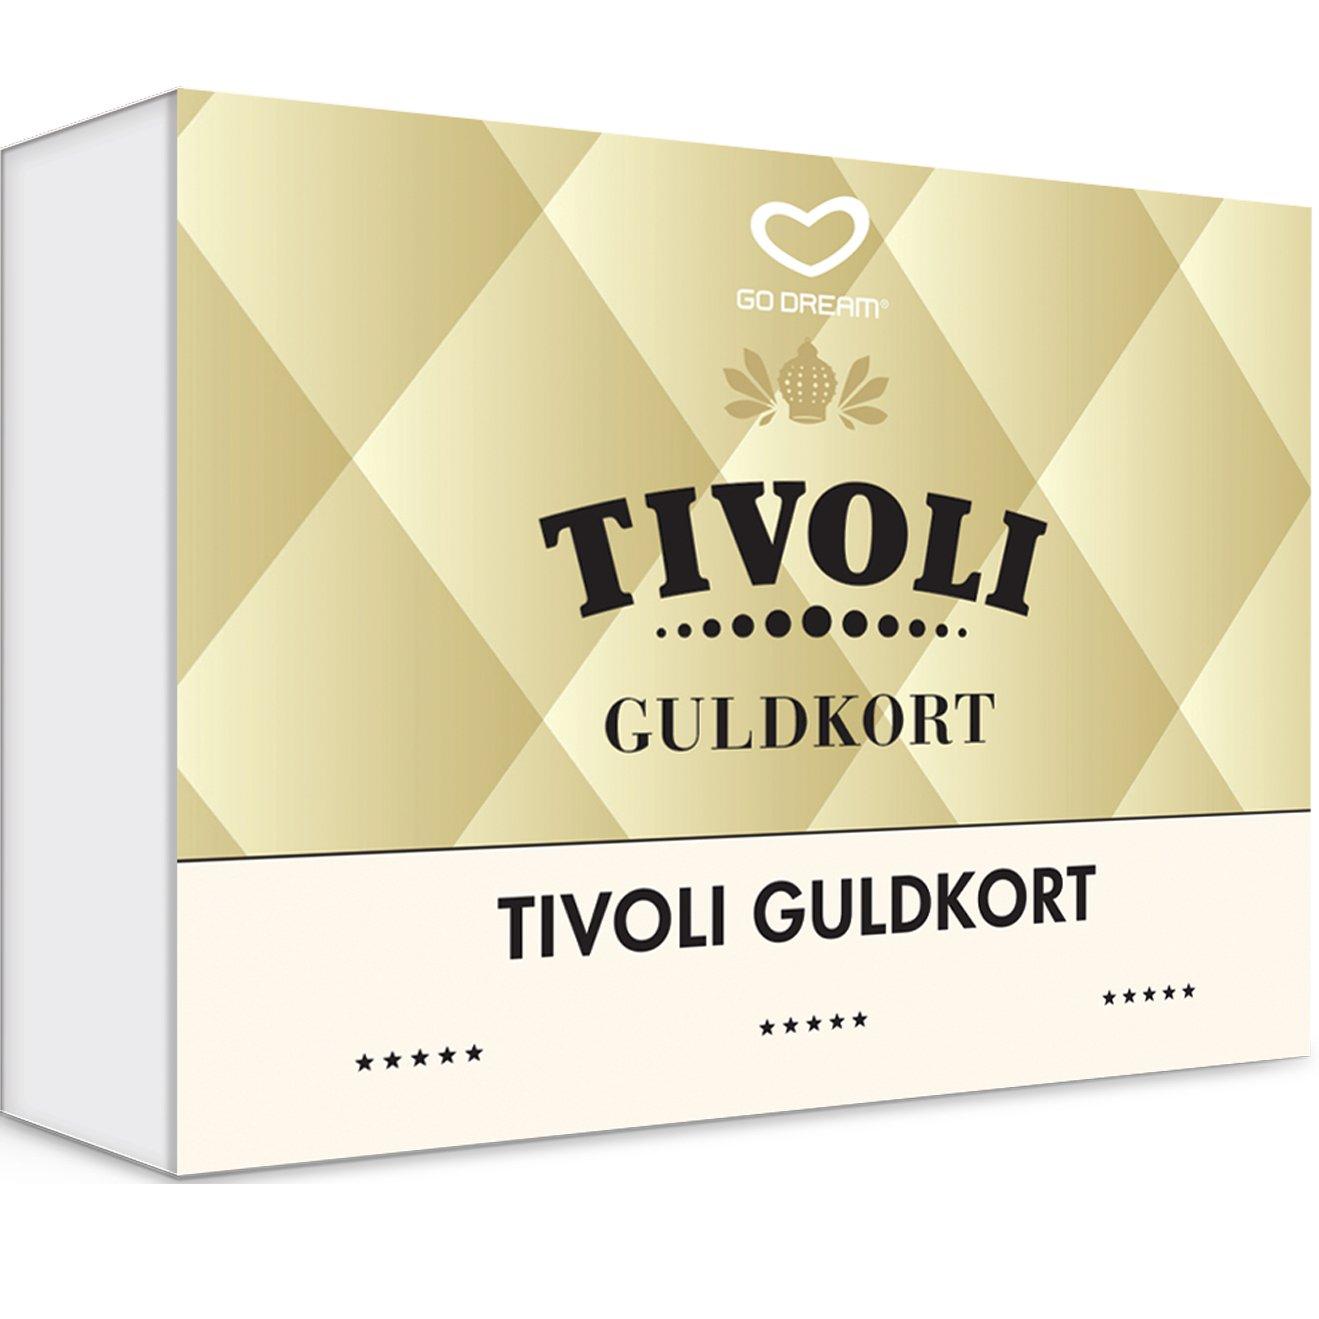 Go Dream Tivoli Guldkort